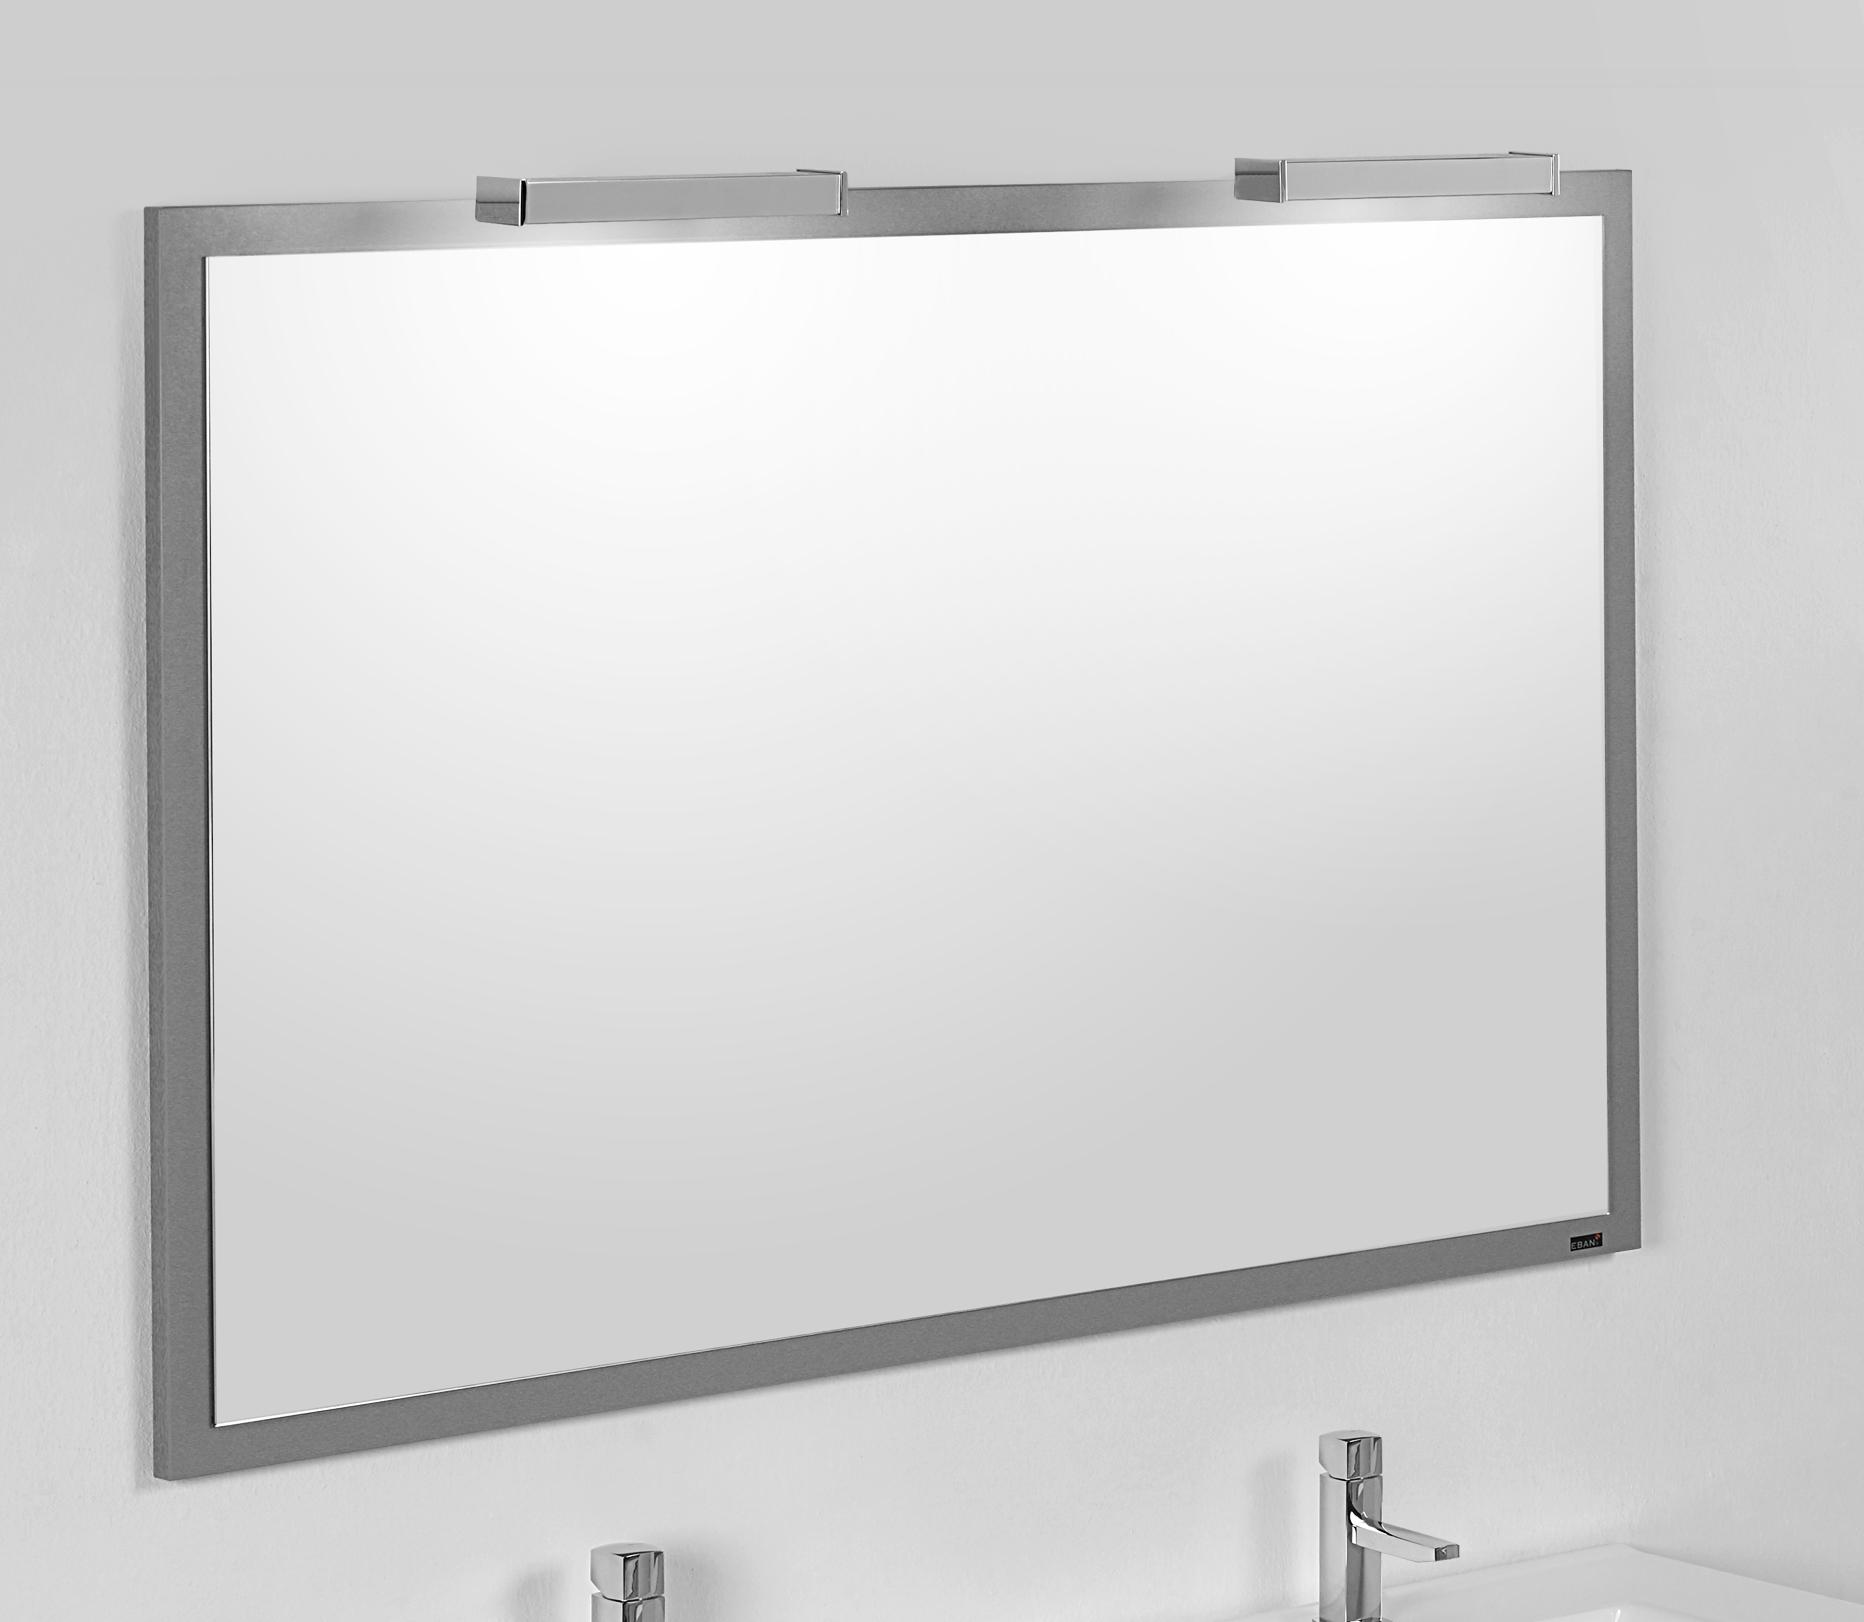 Plan miroirs plan eban for Retourner une photo miroir